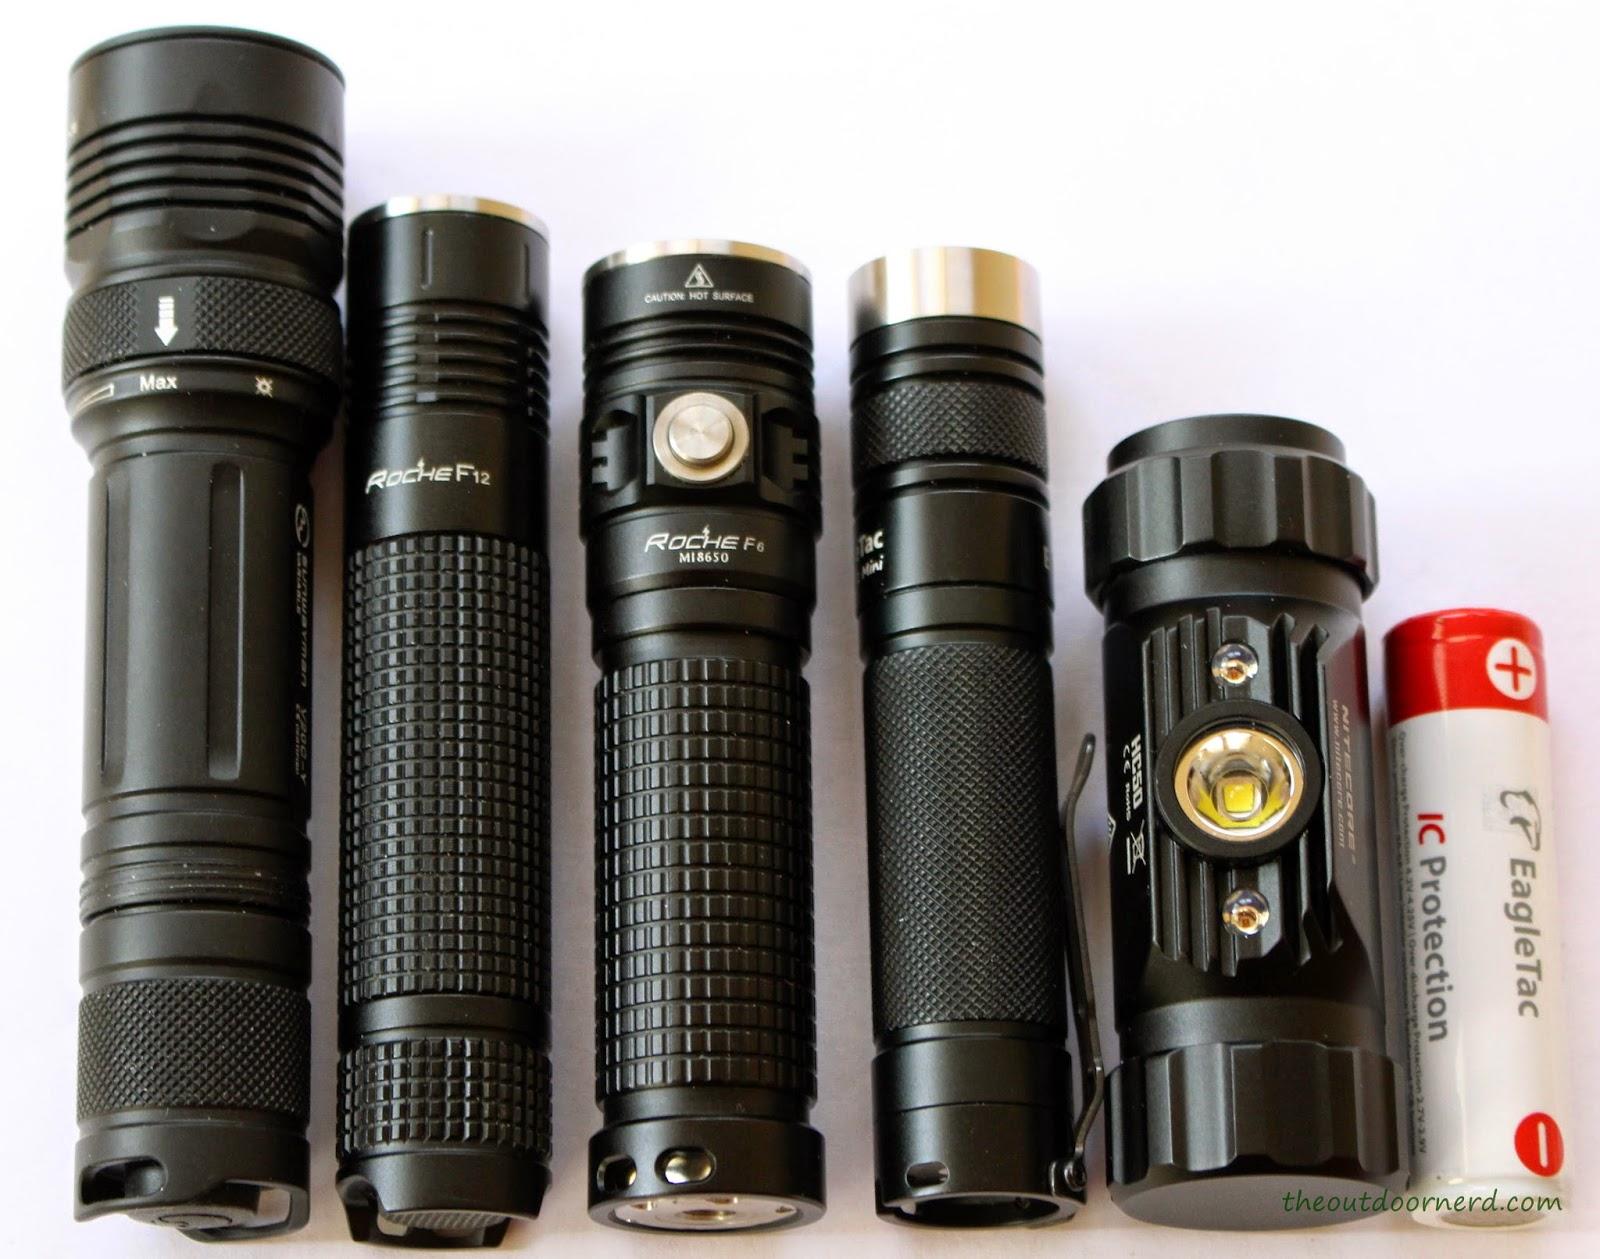 EagleTac D25LC2 Mini 18650 Flashlight With Friends 3